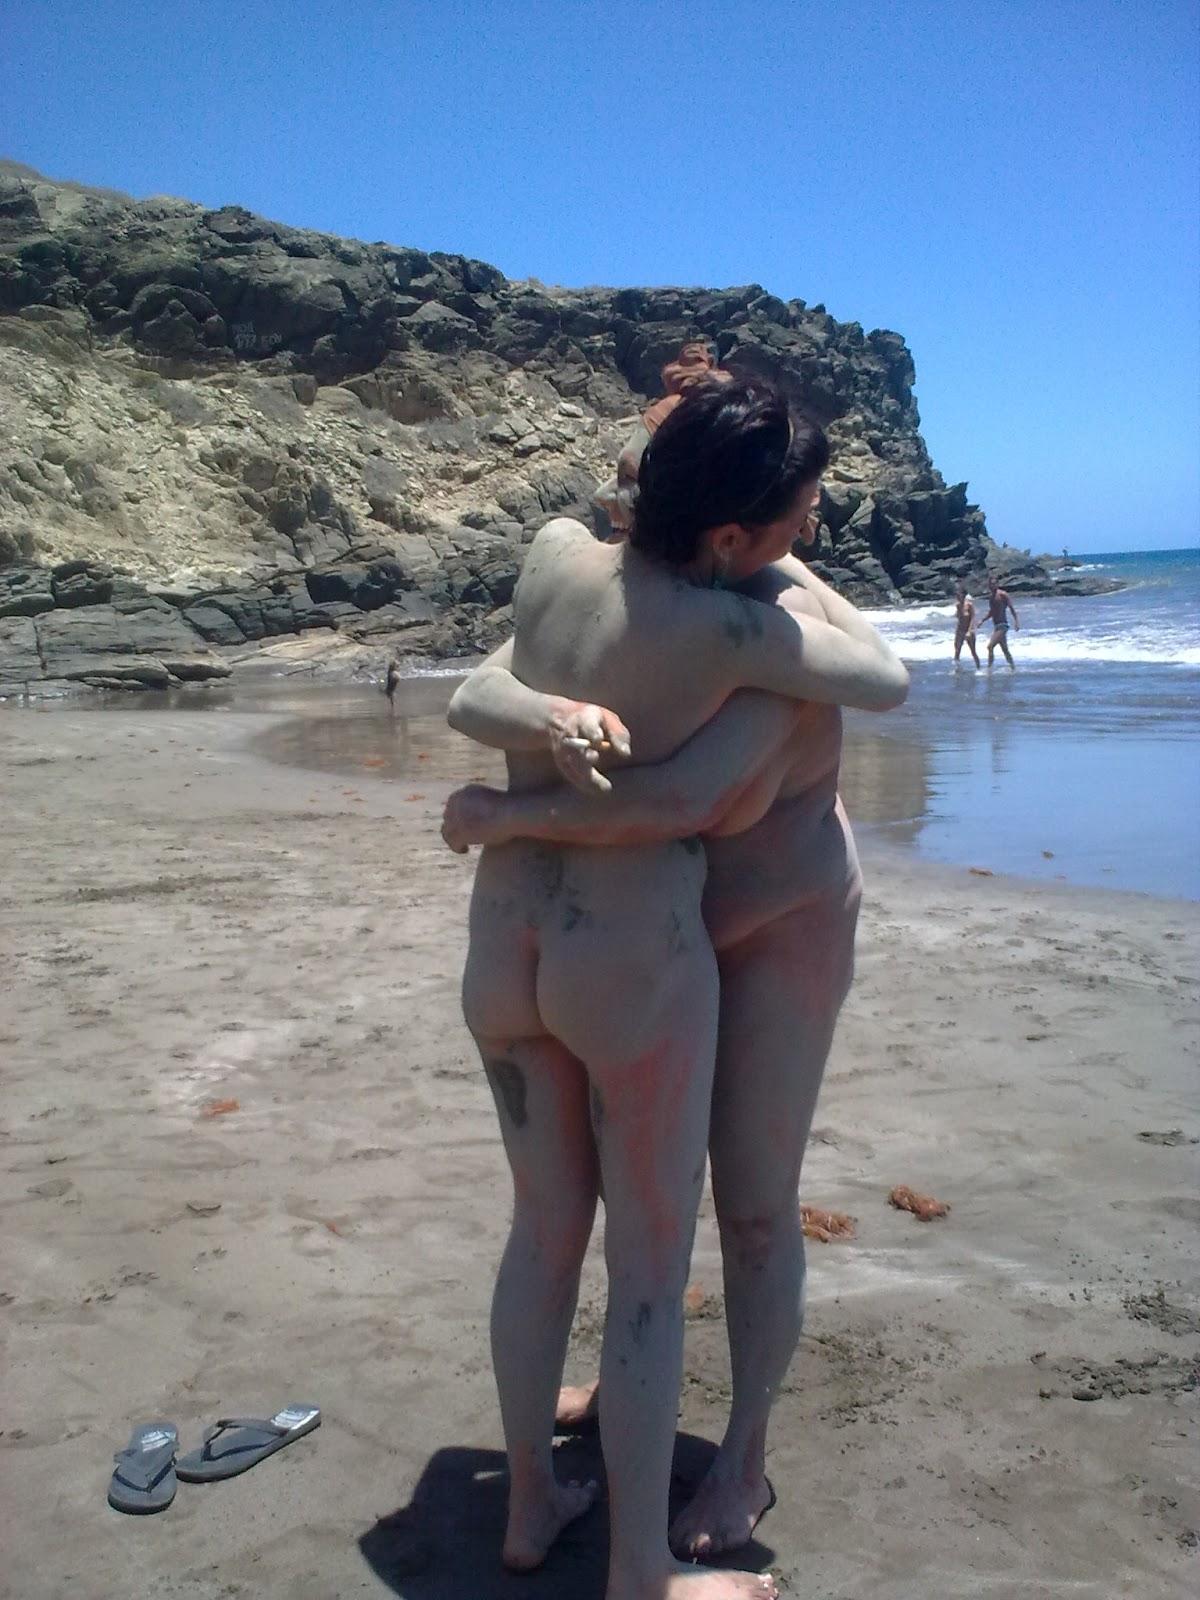 foto persona playa nudista: